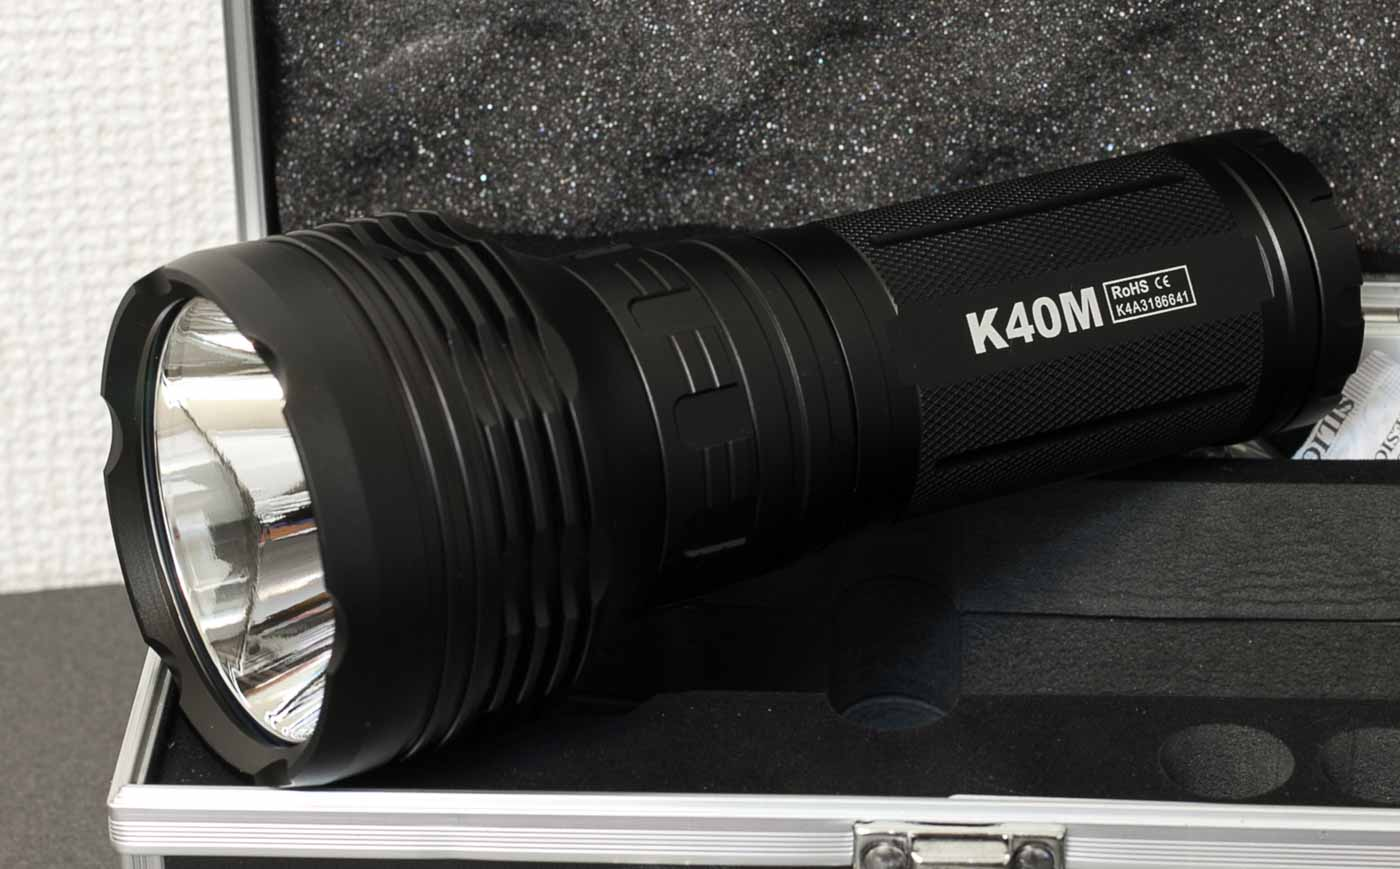 k40m on case